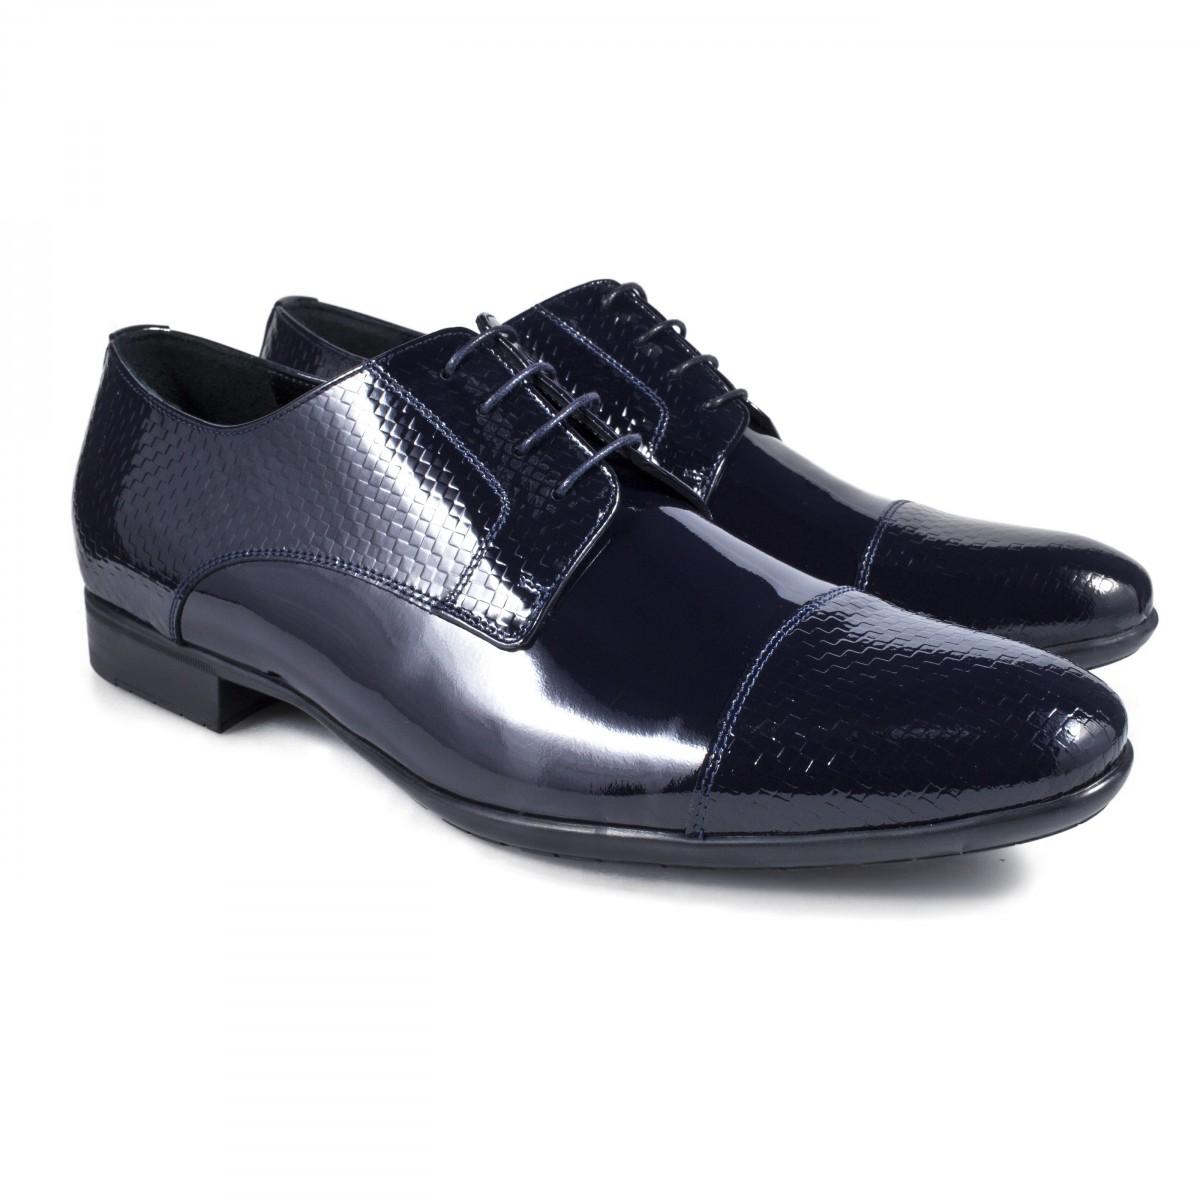 sports shoes 54821 36641 Scarpe cerimonia uomo, Derby